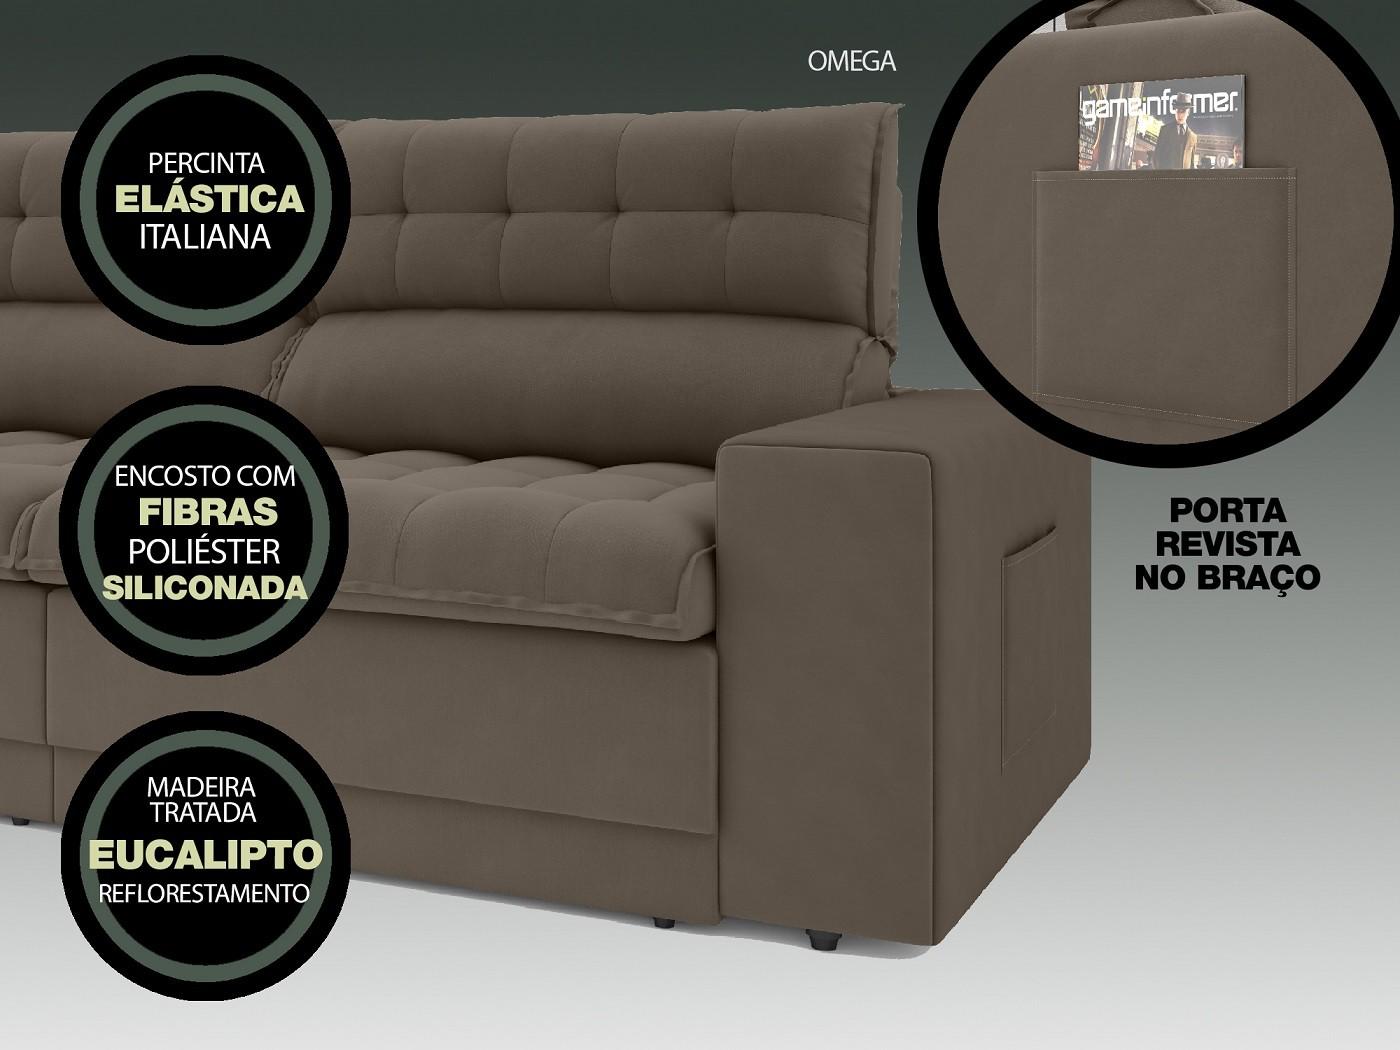 Sofá Omega 2,00m Assento Retrátil e Reclinável Velosuede Marrom - NETSOFAS  - NETSOFÁS